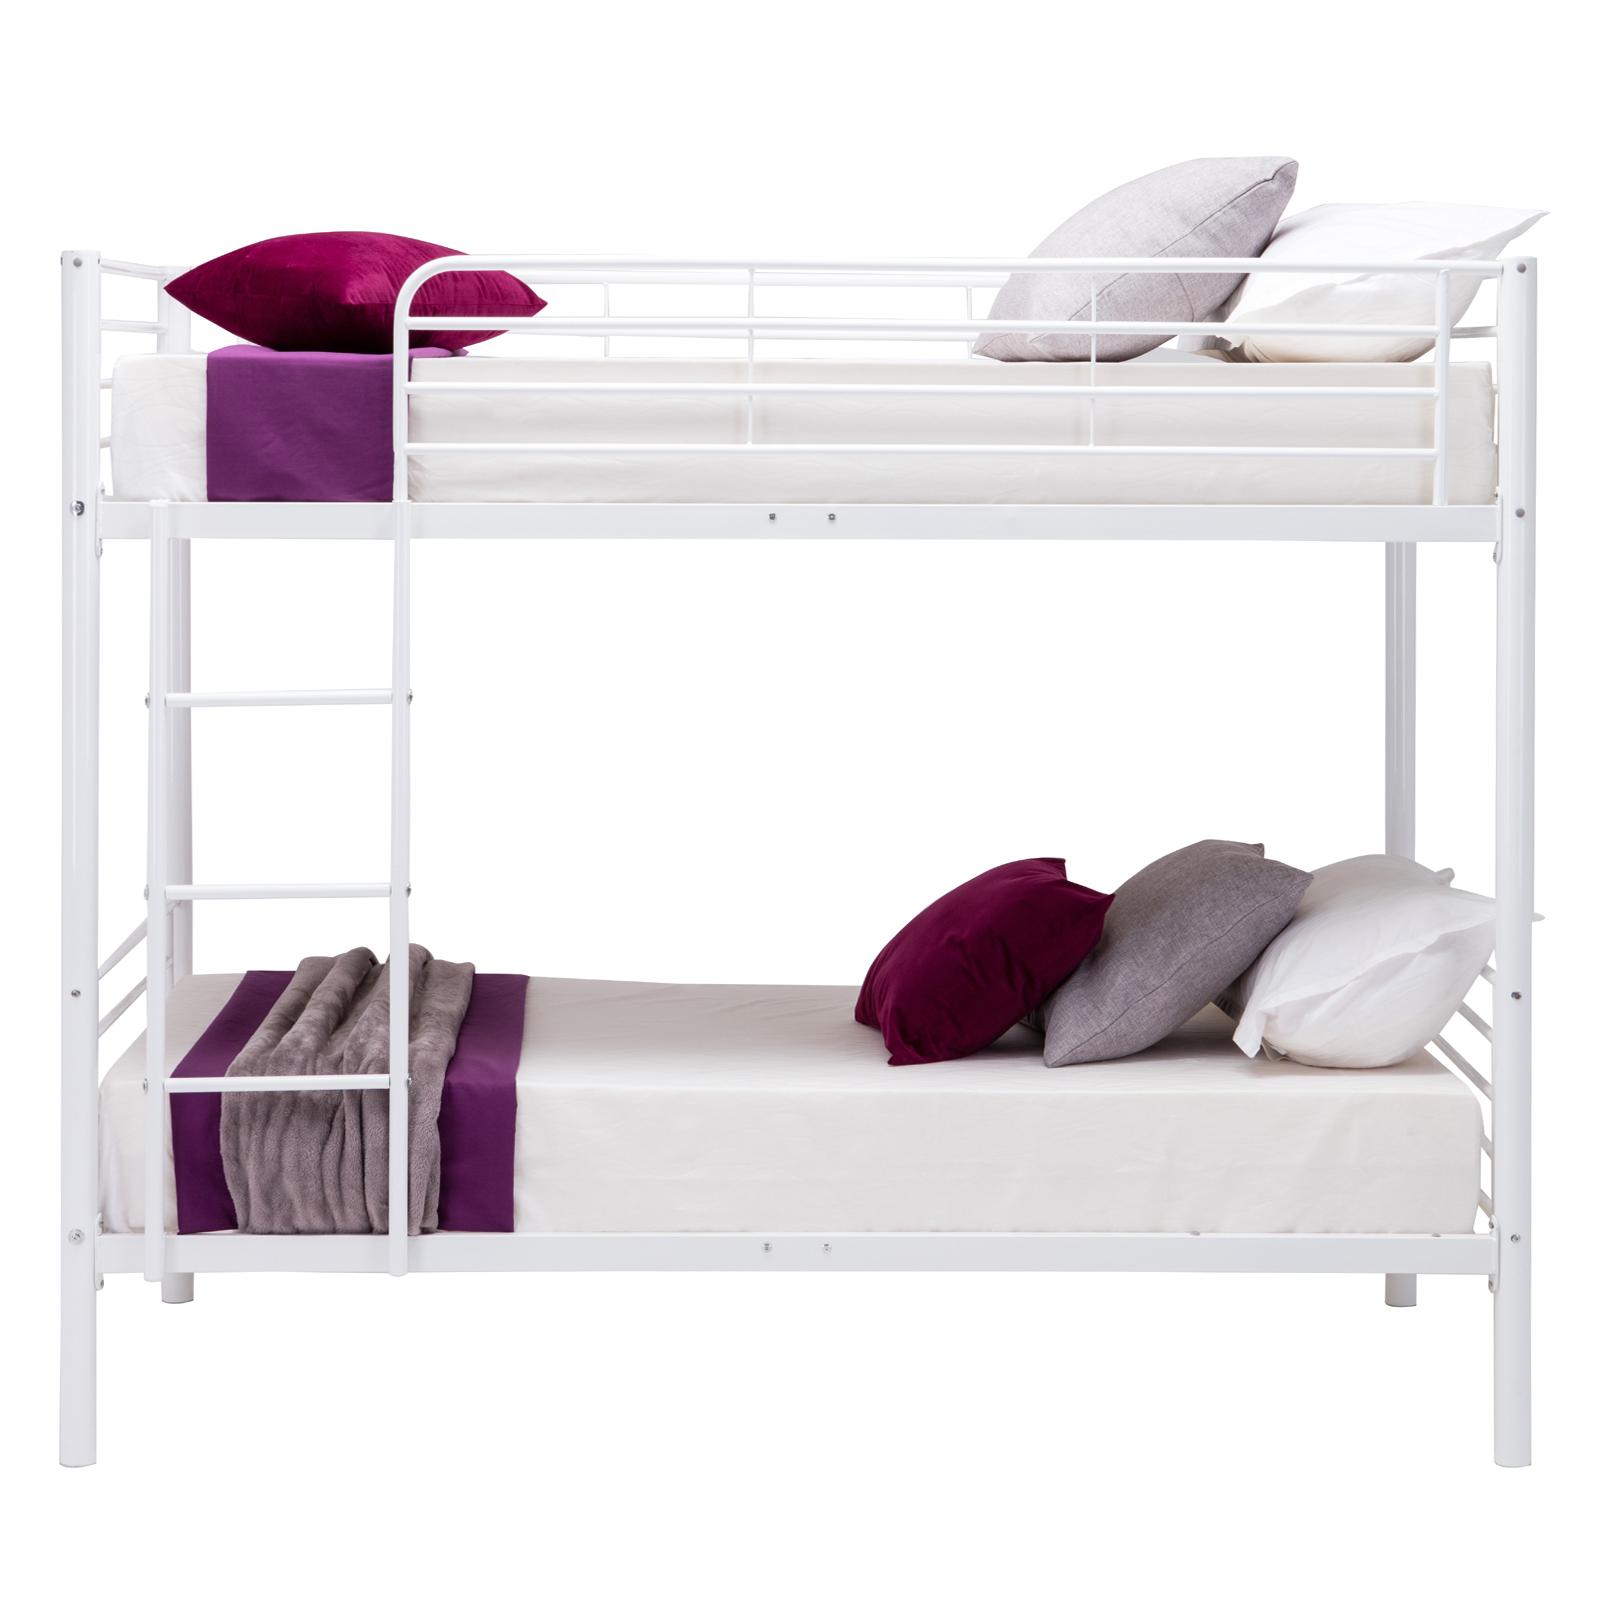 Metal Bunk Beds Frame Twin Over Twin Ladder Bedroom Dorm